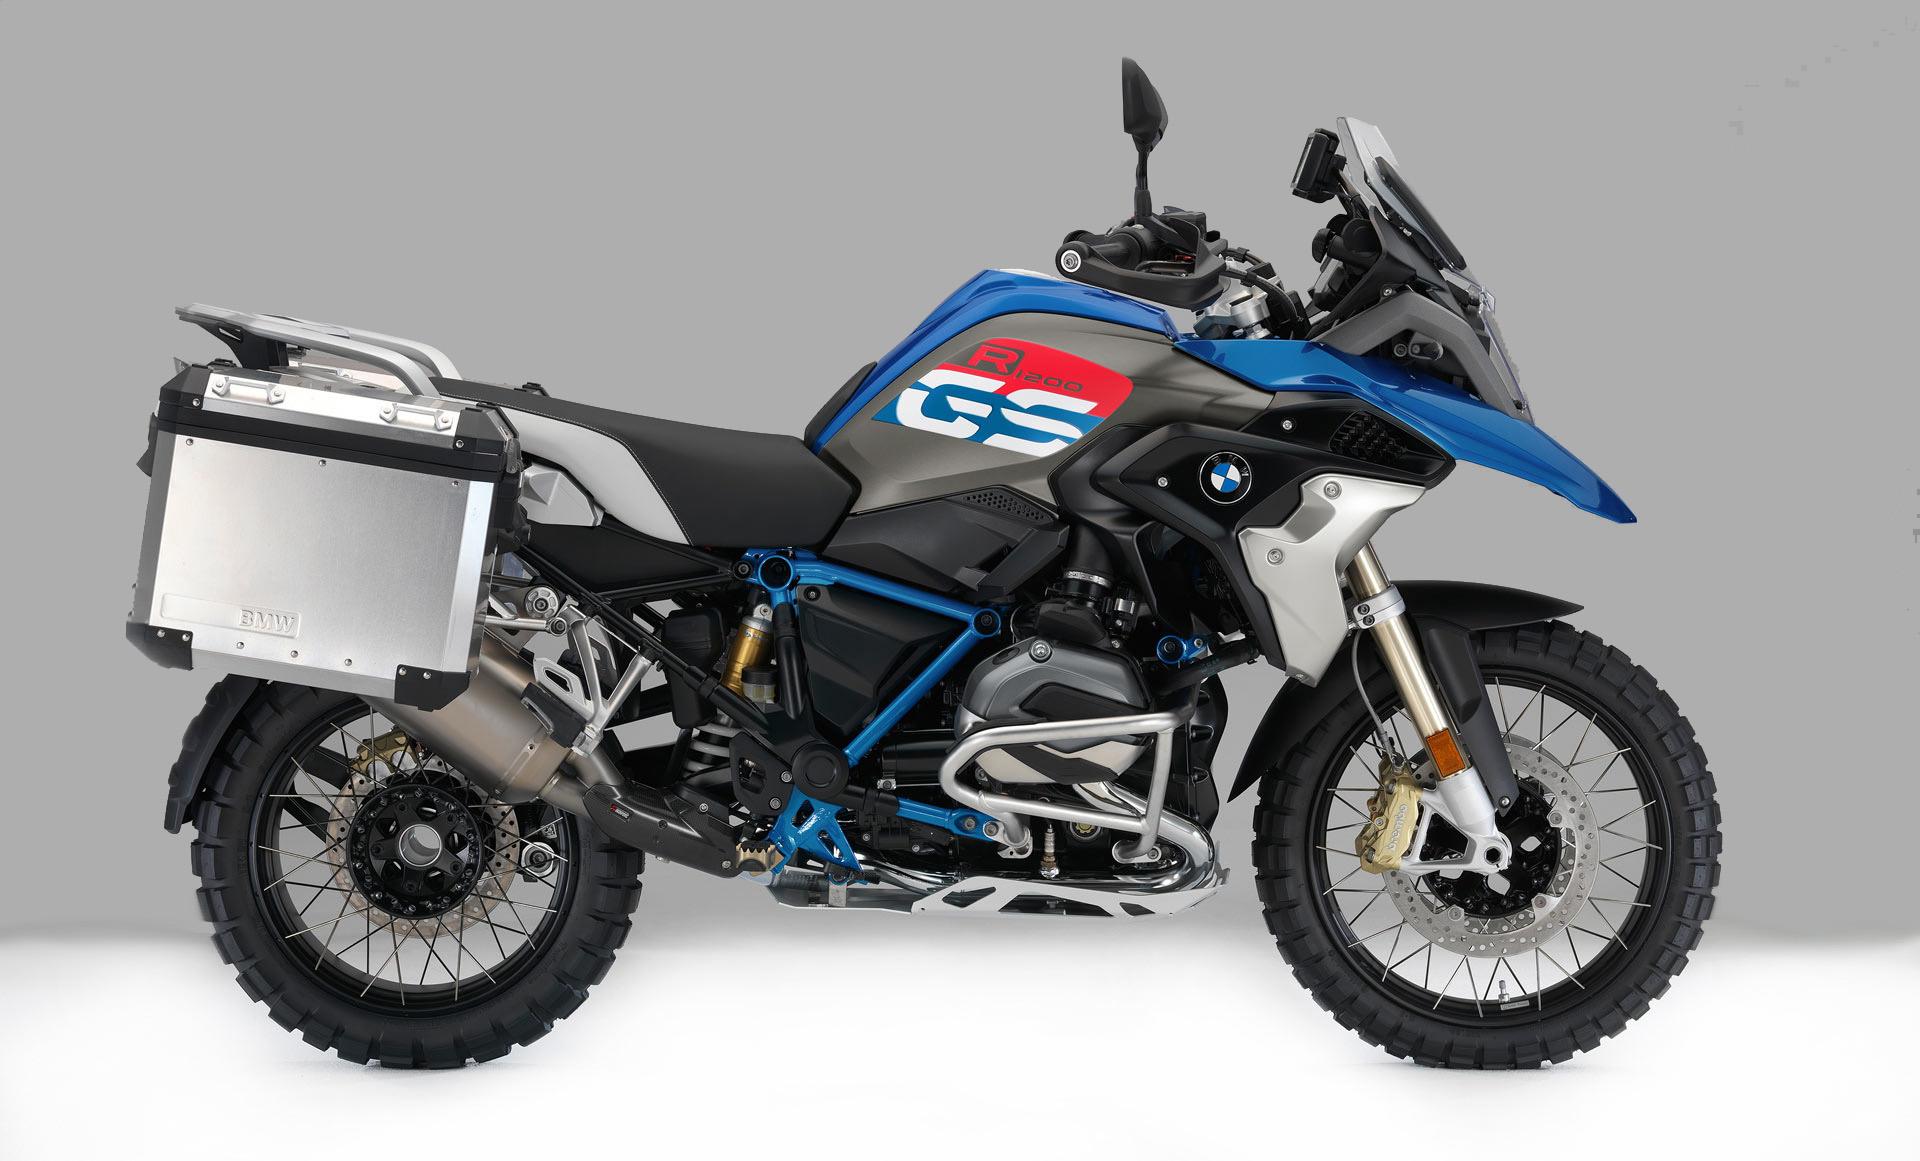 BMW-R-1200-GS-Rallye-10